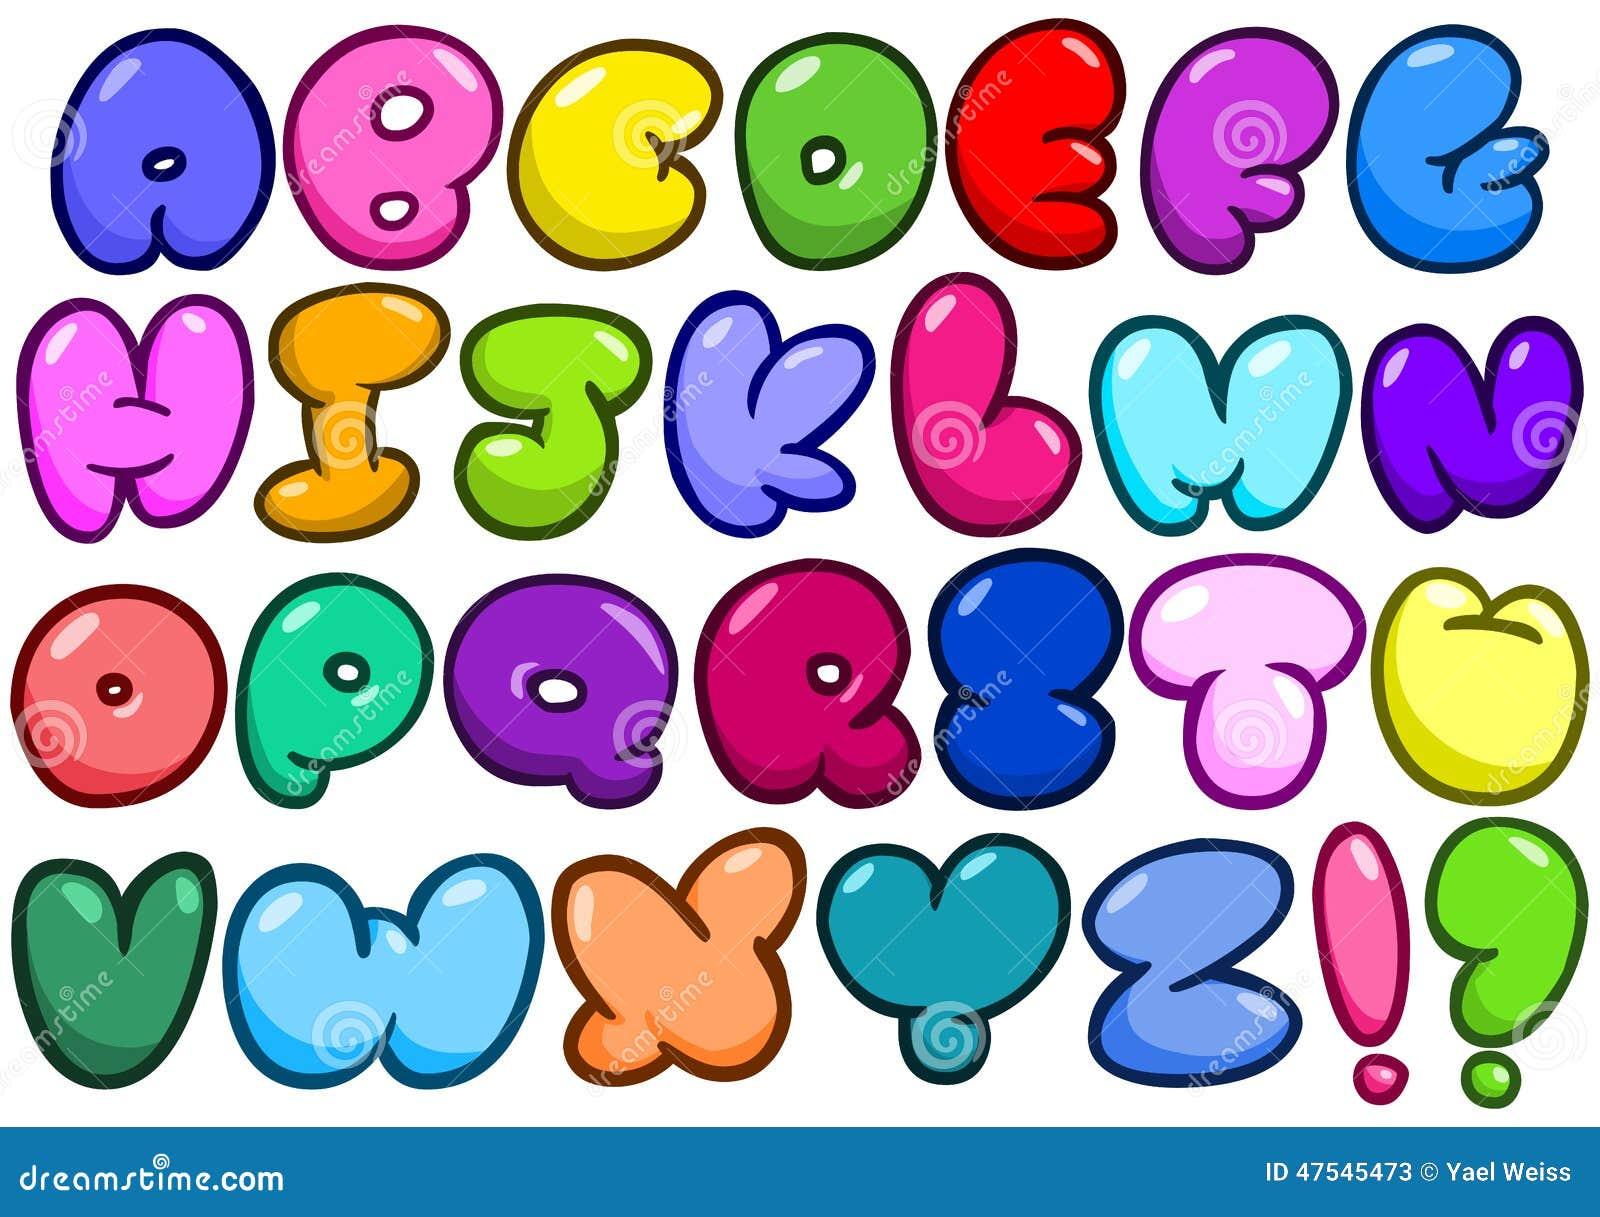 Comic Bubble Alphabet Stock Vector - Image: 47545473